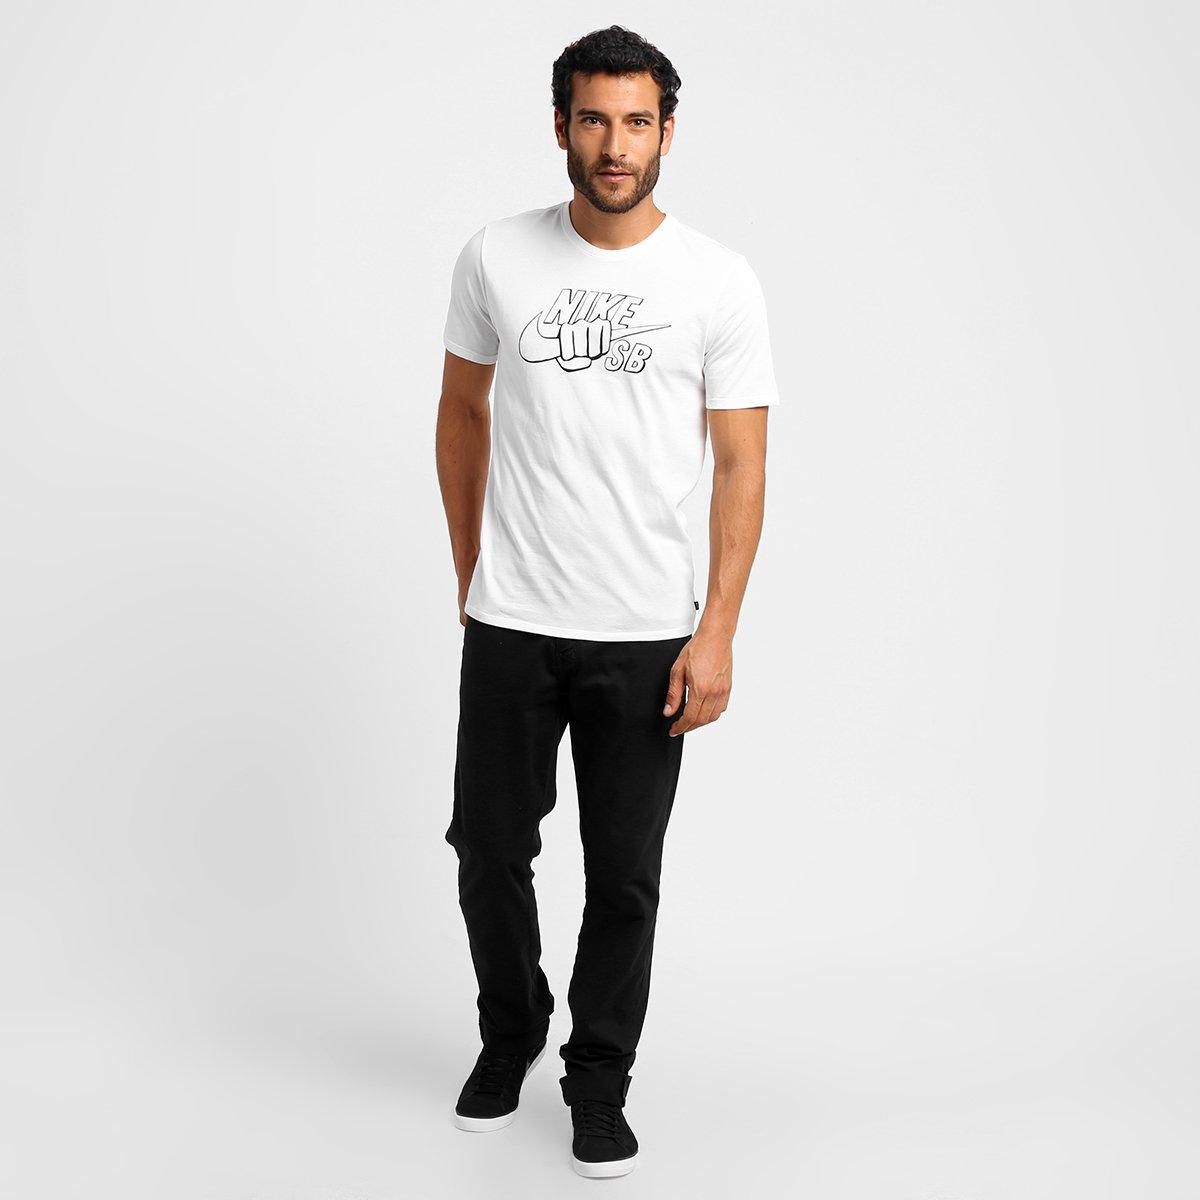 238daecca8 Camiseta Nike SB Gm Icon Tee - Compre Agora